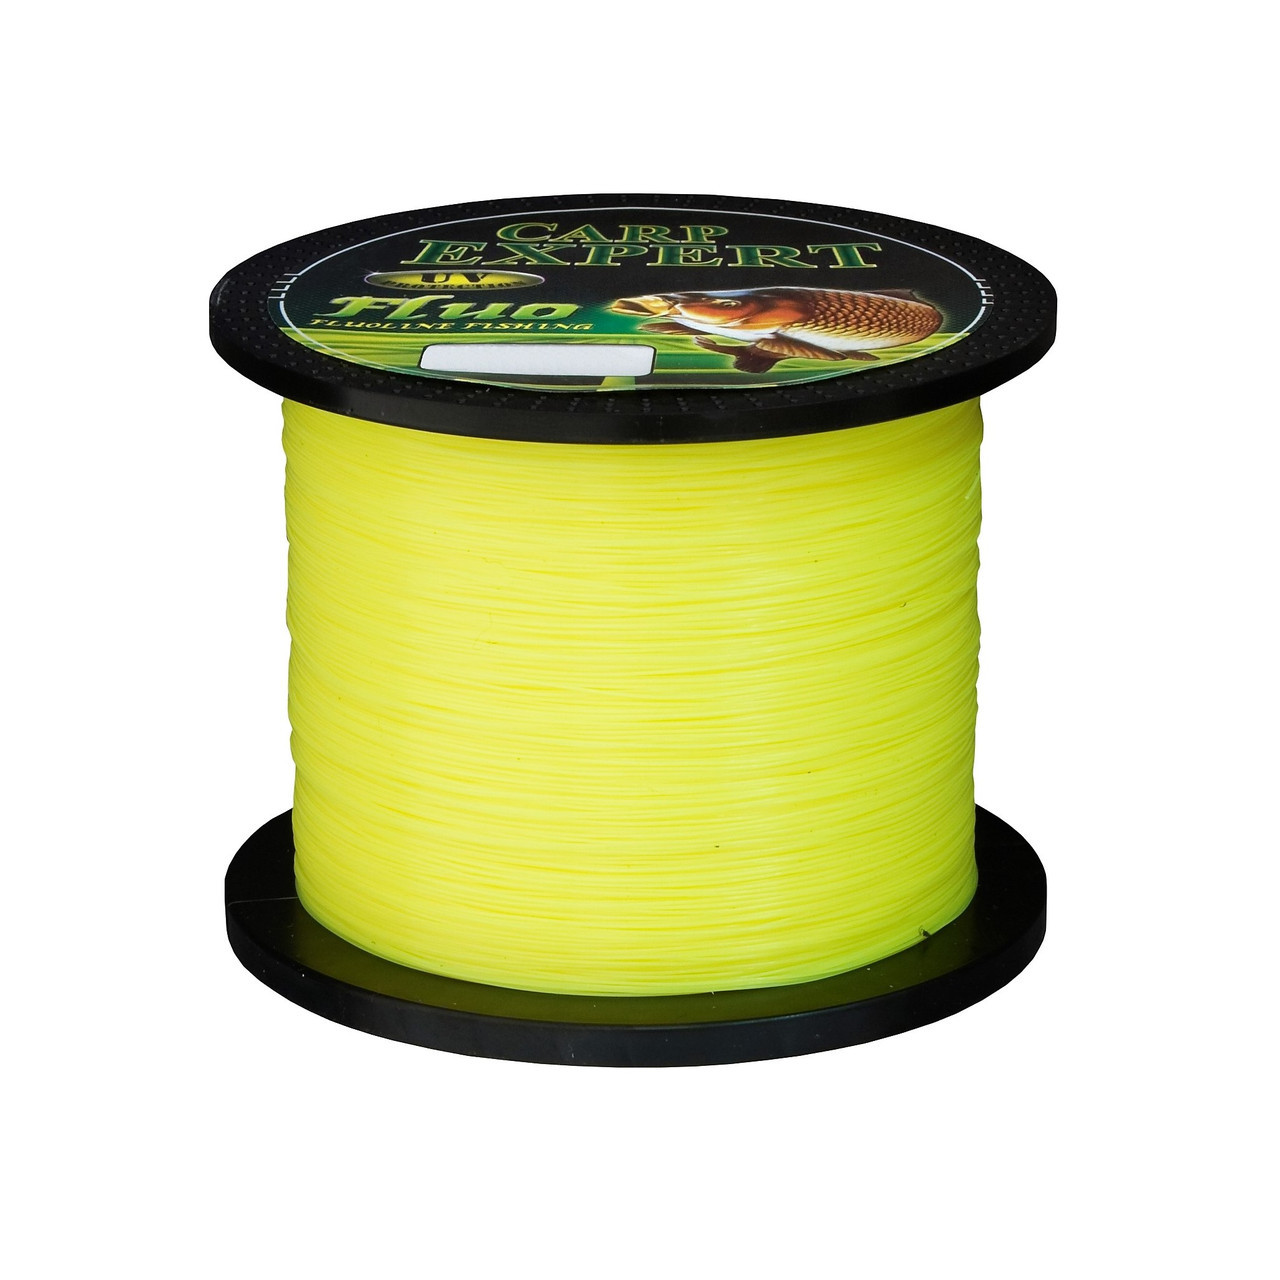 Леска Energofish Carp Expert UV Fluo Yellow 1000m 0.30mm 12.5kg (30120830)